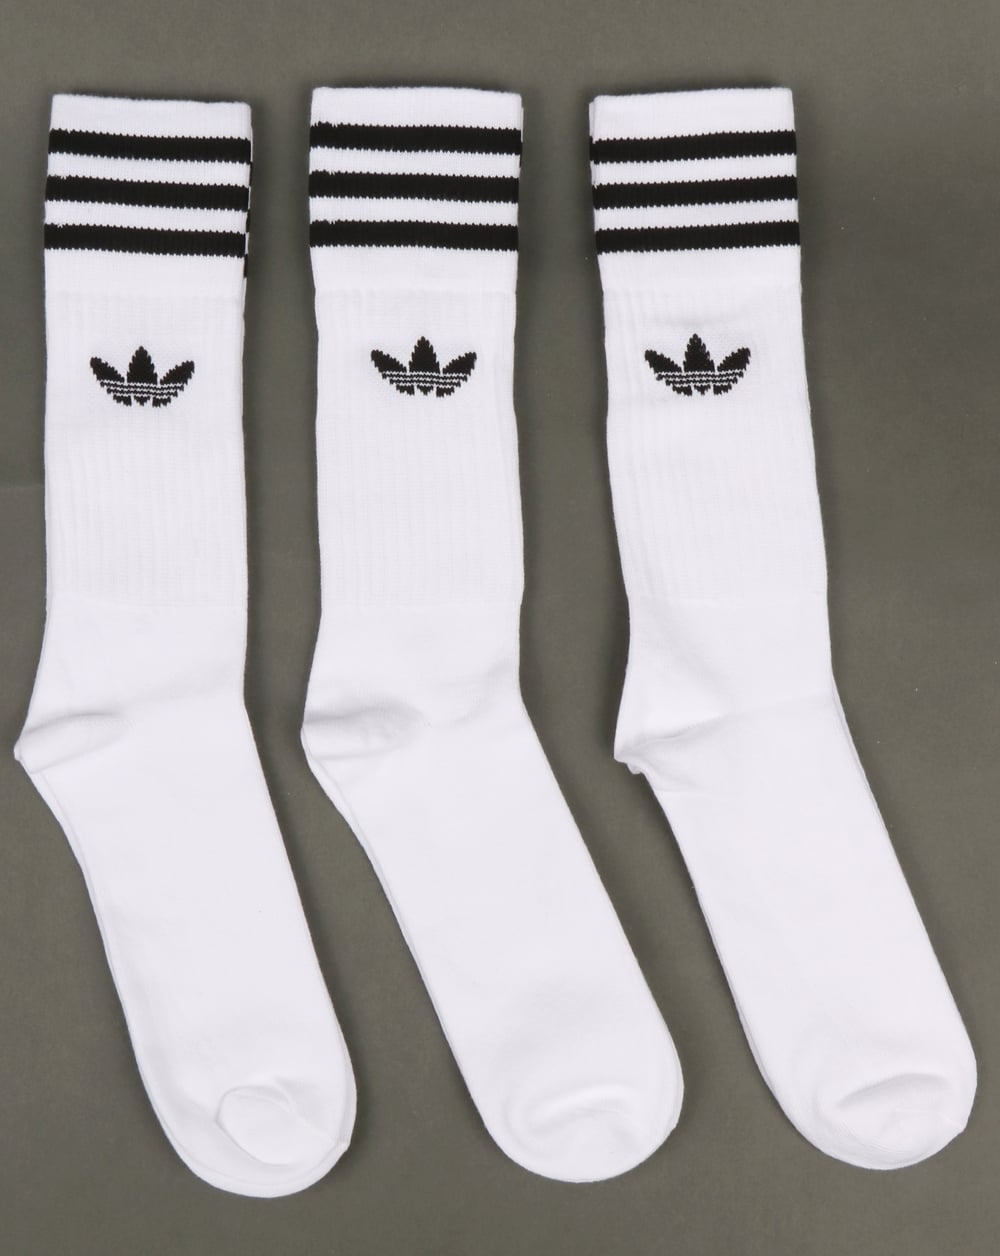 adidas 3 stripes socks